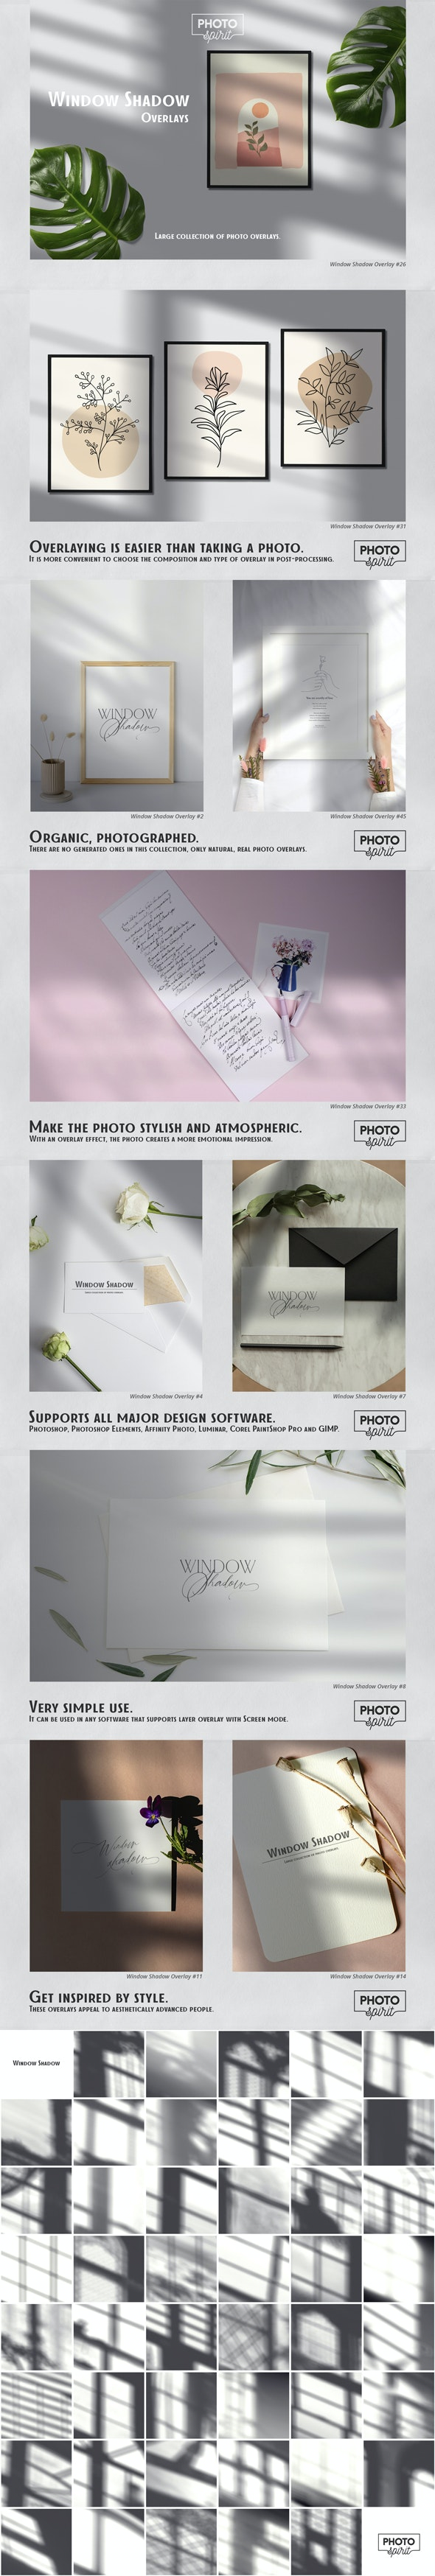 Window Shadow Overlays - Photoshop Add-ons